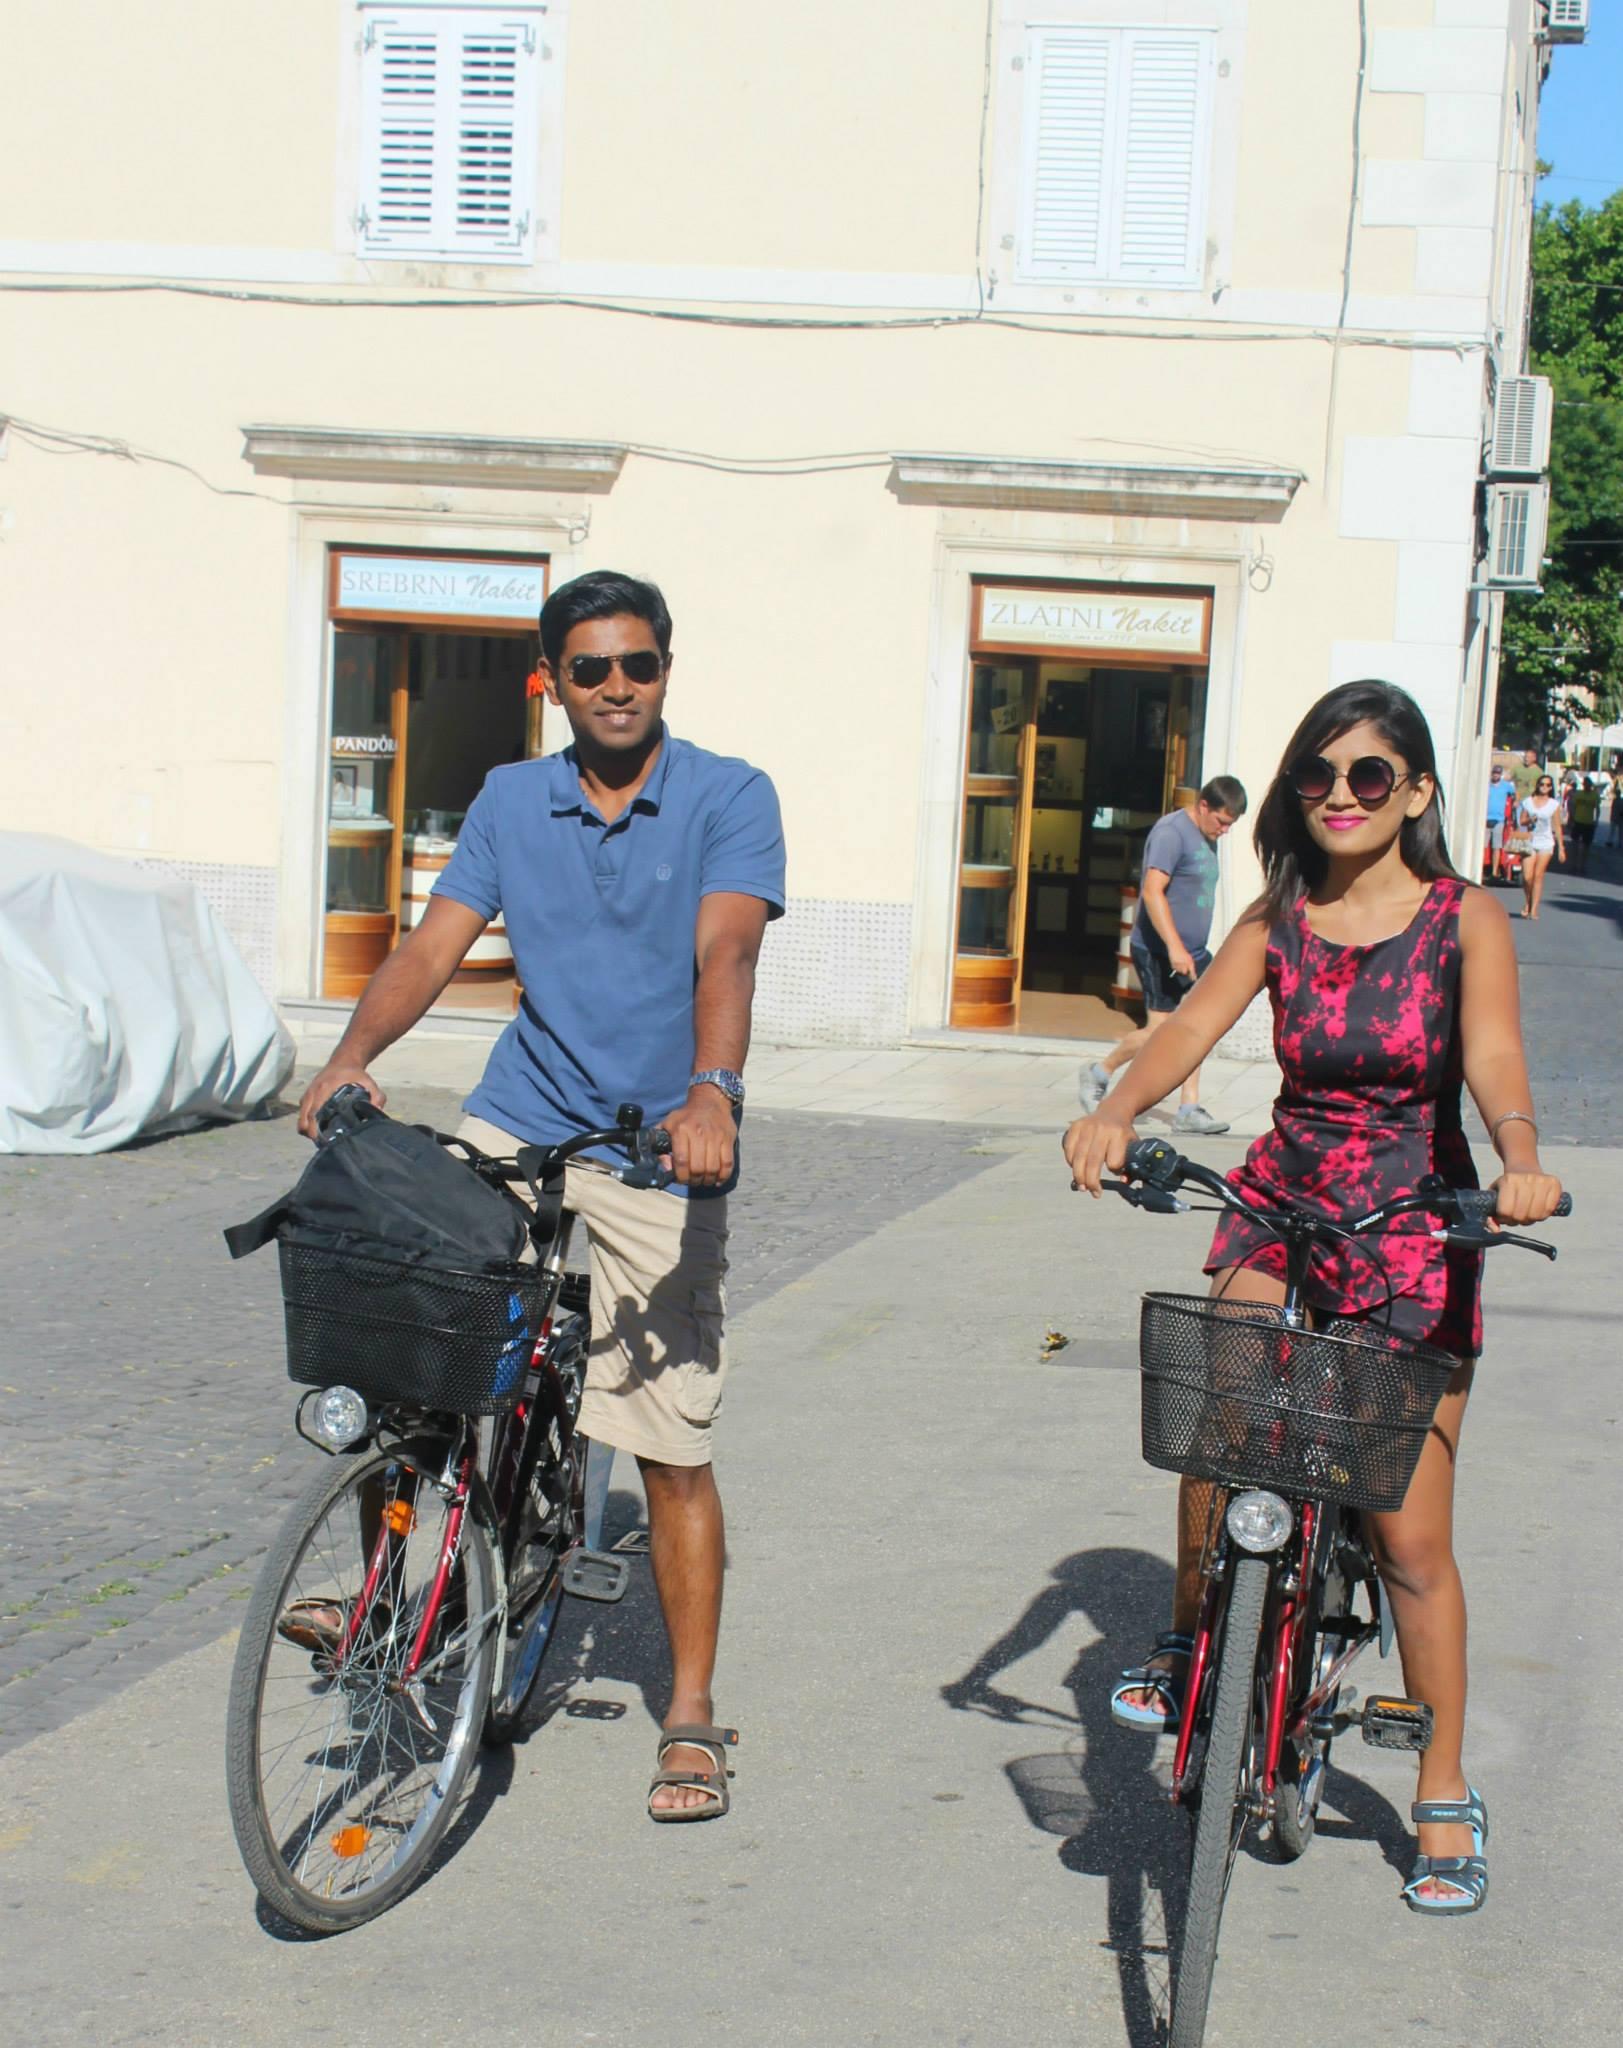 Bike Tour through Ancient Split